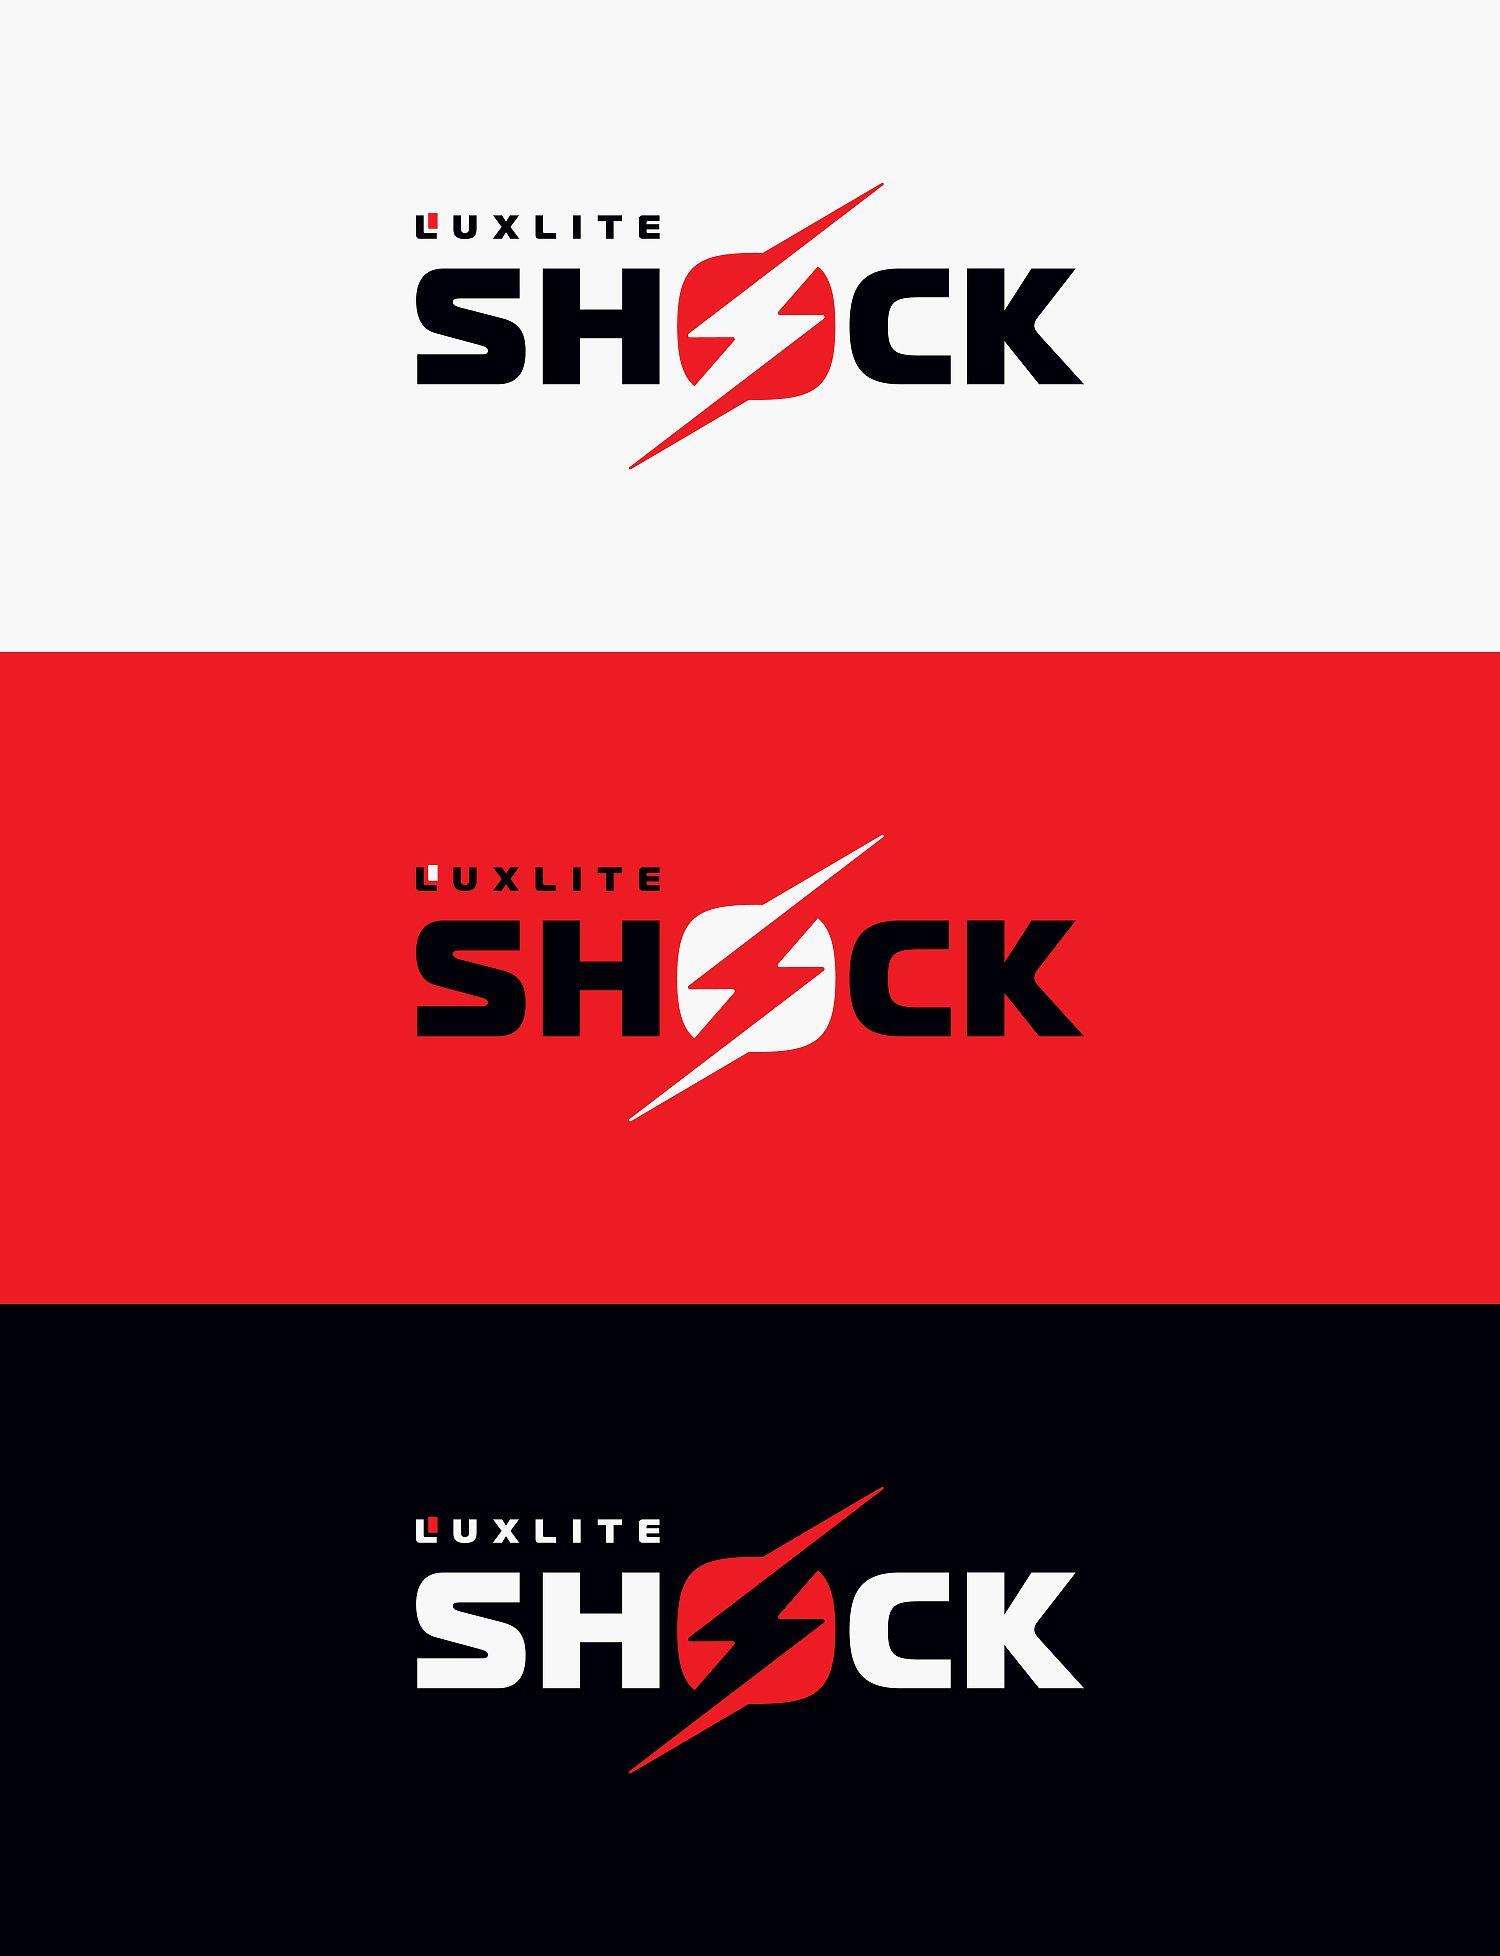 Логотип для батареек LUXLITE SHOCK - дизайнер AnZel